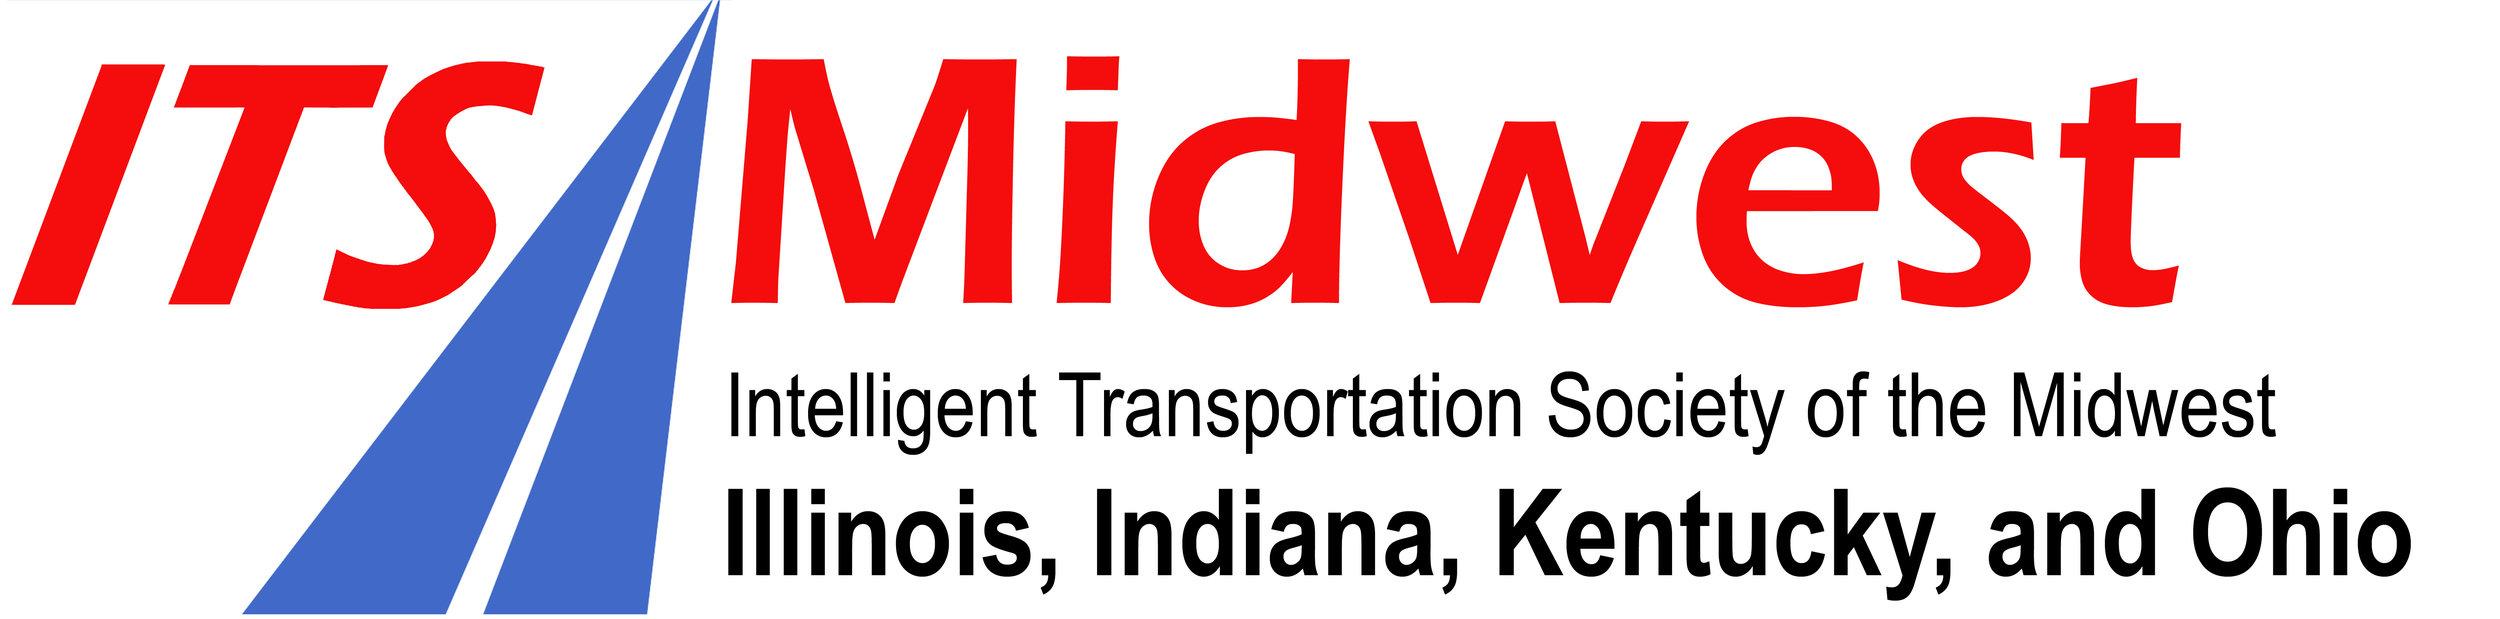 Final New ITSMW Logo LARGE-4 state.jpg